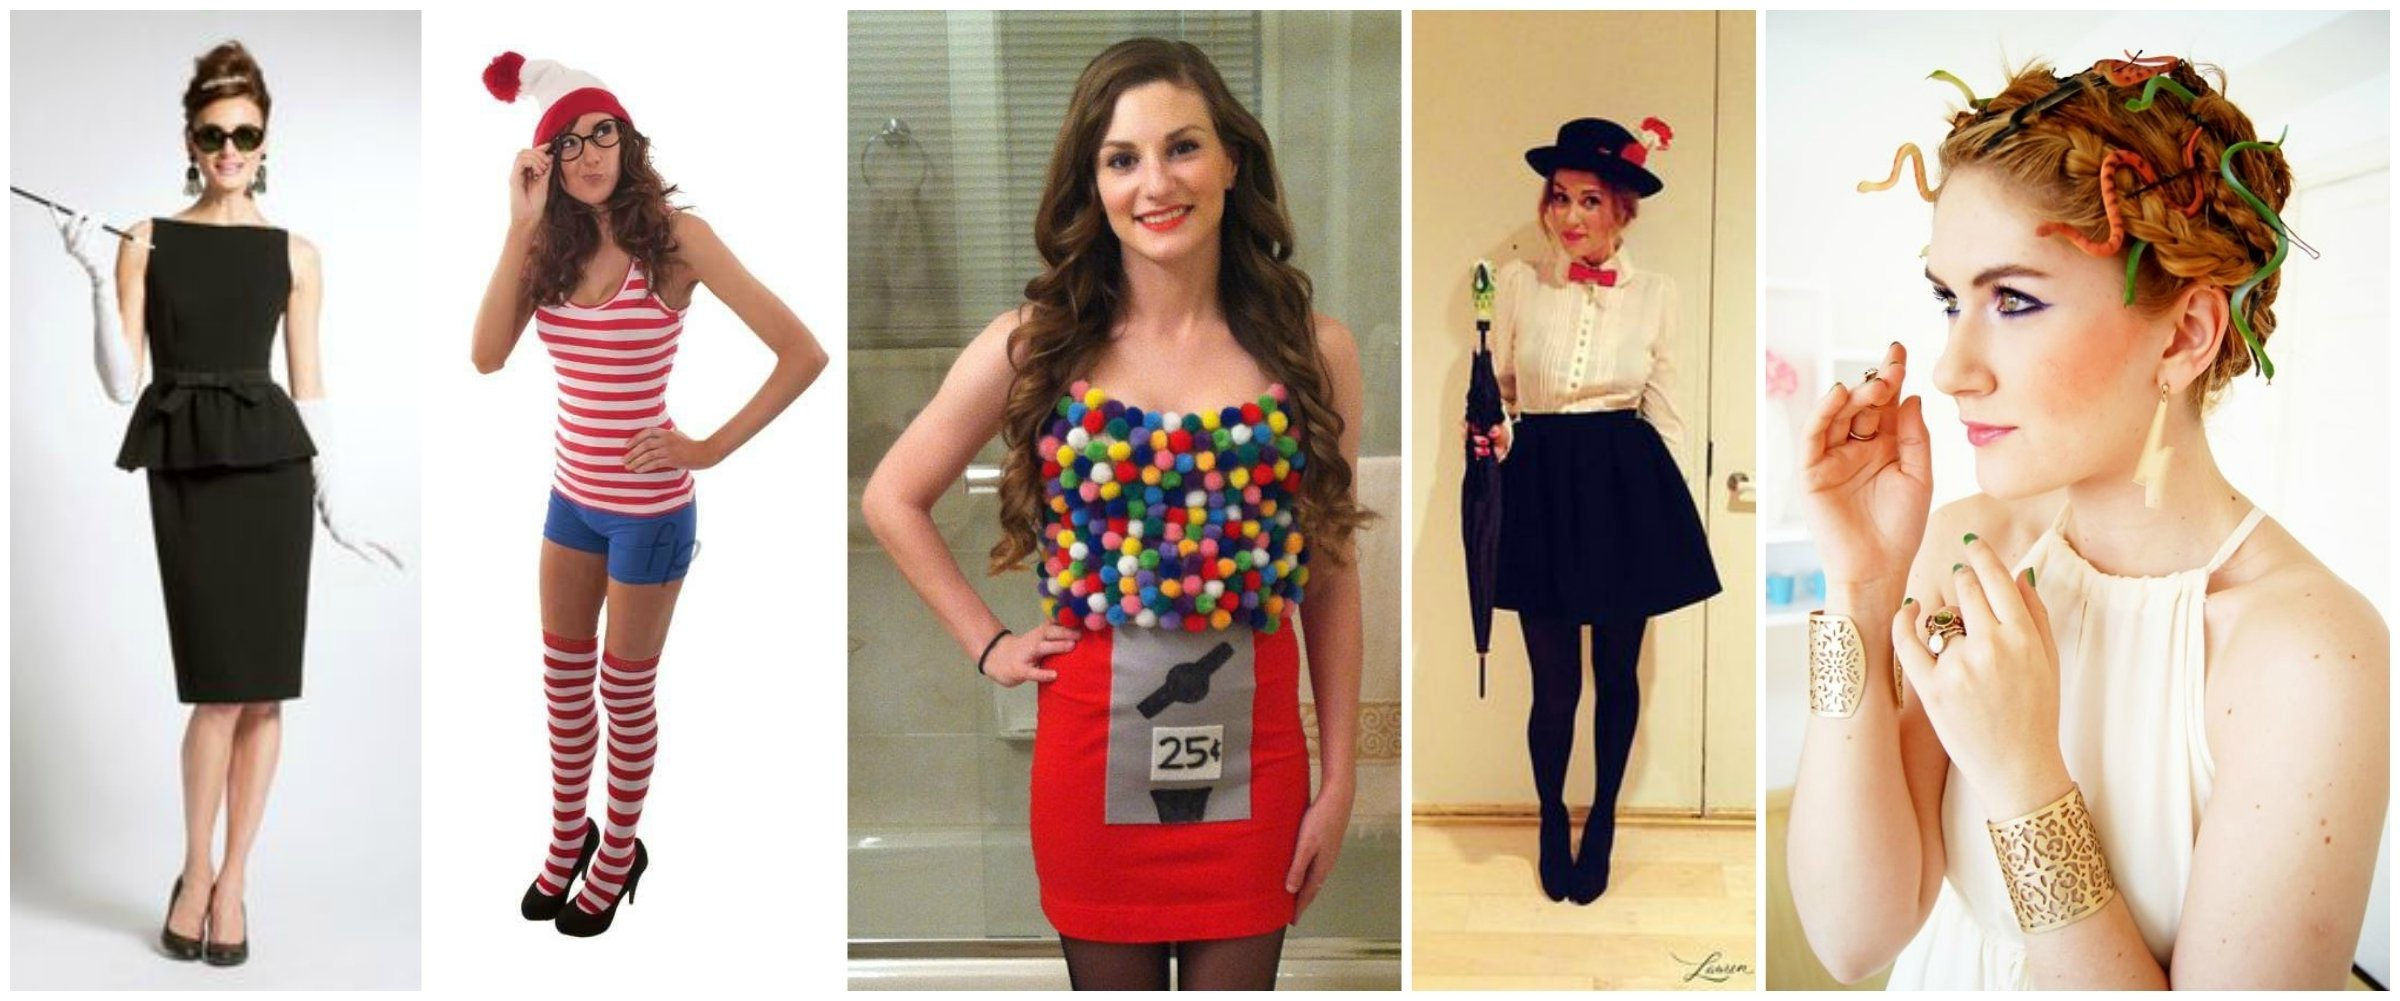 10 Gorgeous Easy Halloween Costume Ideas Women diy halloween costume ideas diyfyi costume ideas for samorzady 2 2020